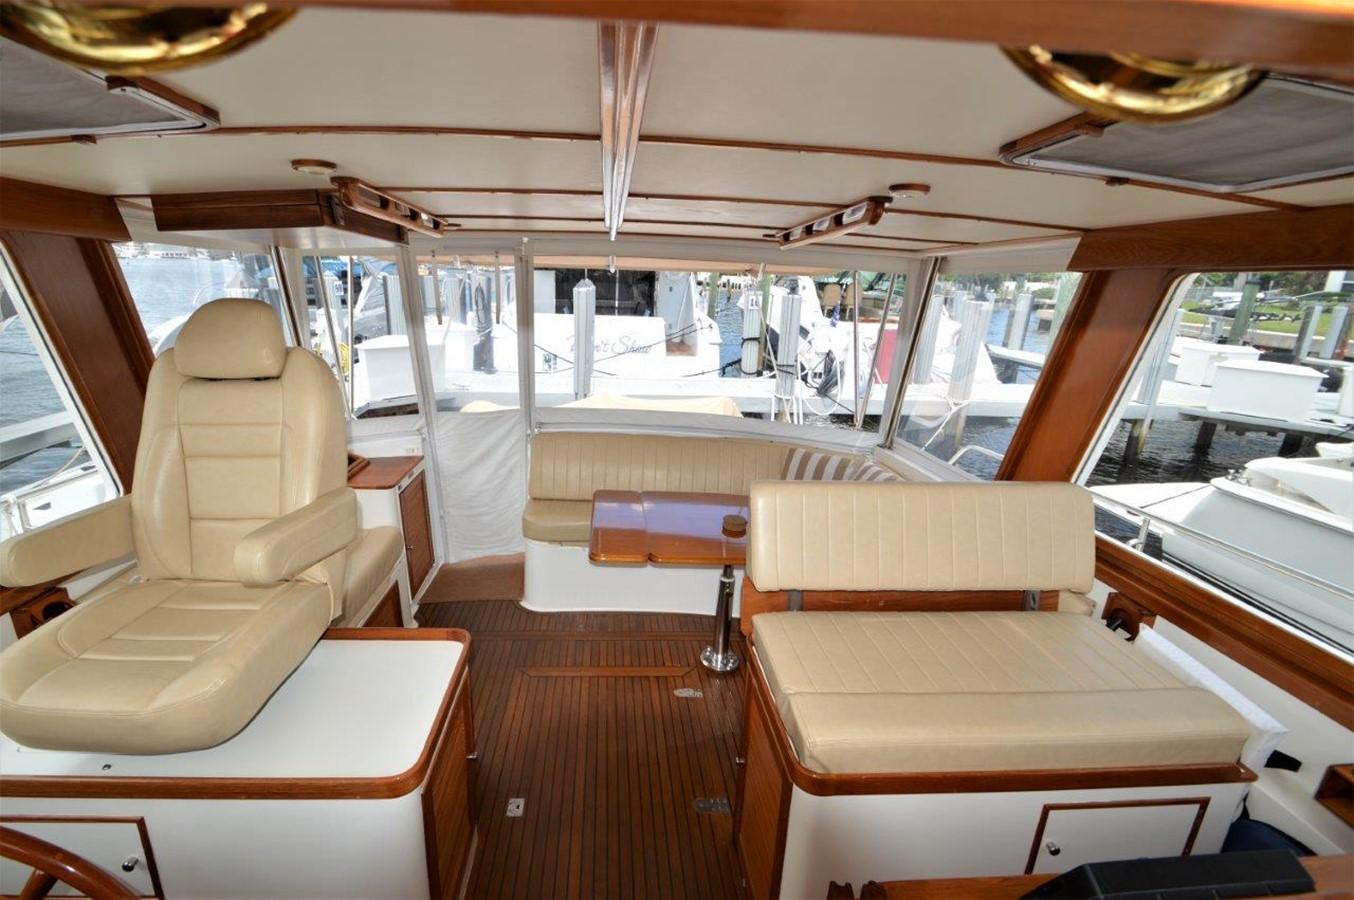 2000 GRAND BANKS 49 Eastbay HX Cruiser 2669757